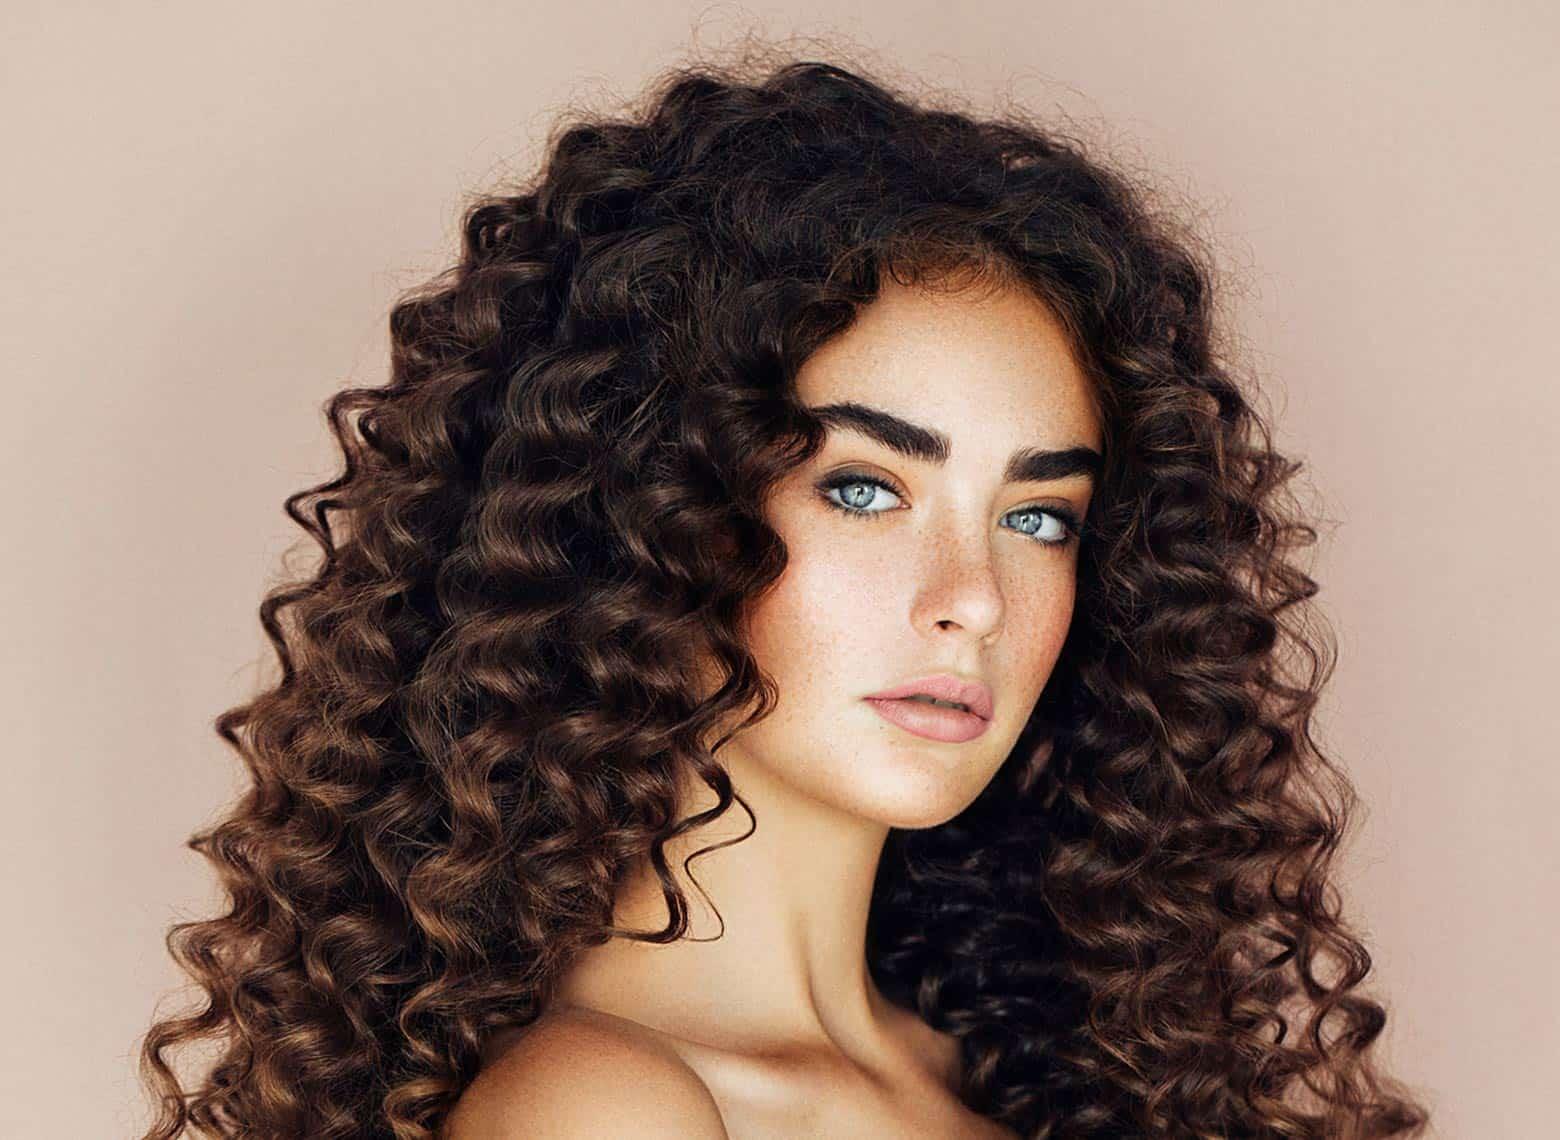 woman with barrel curls